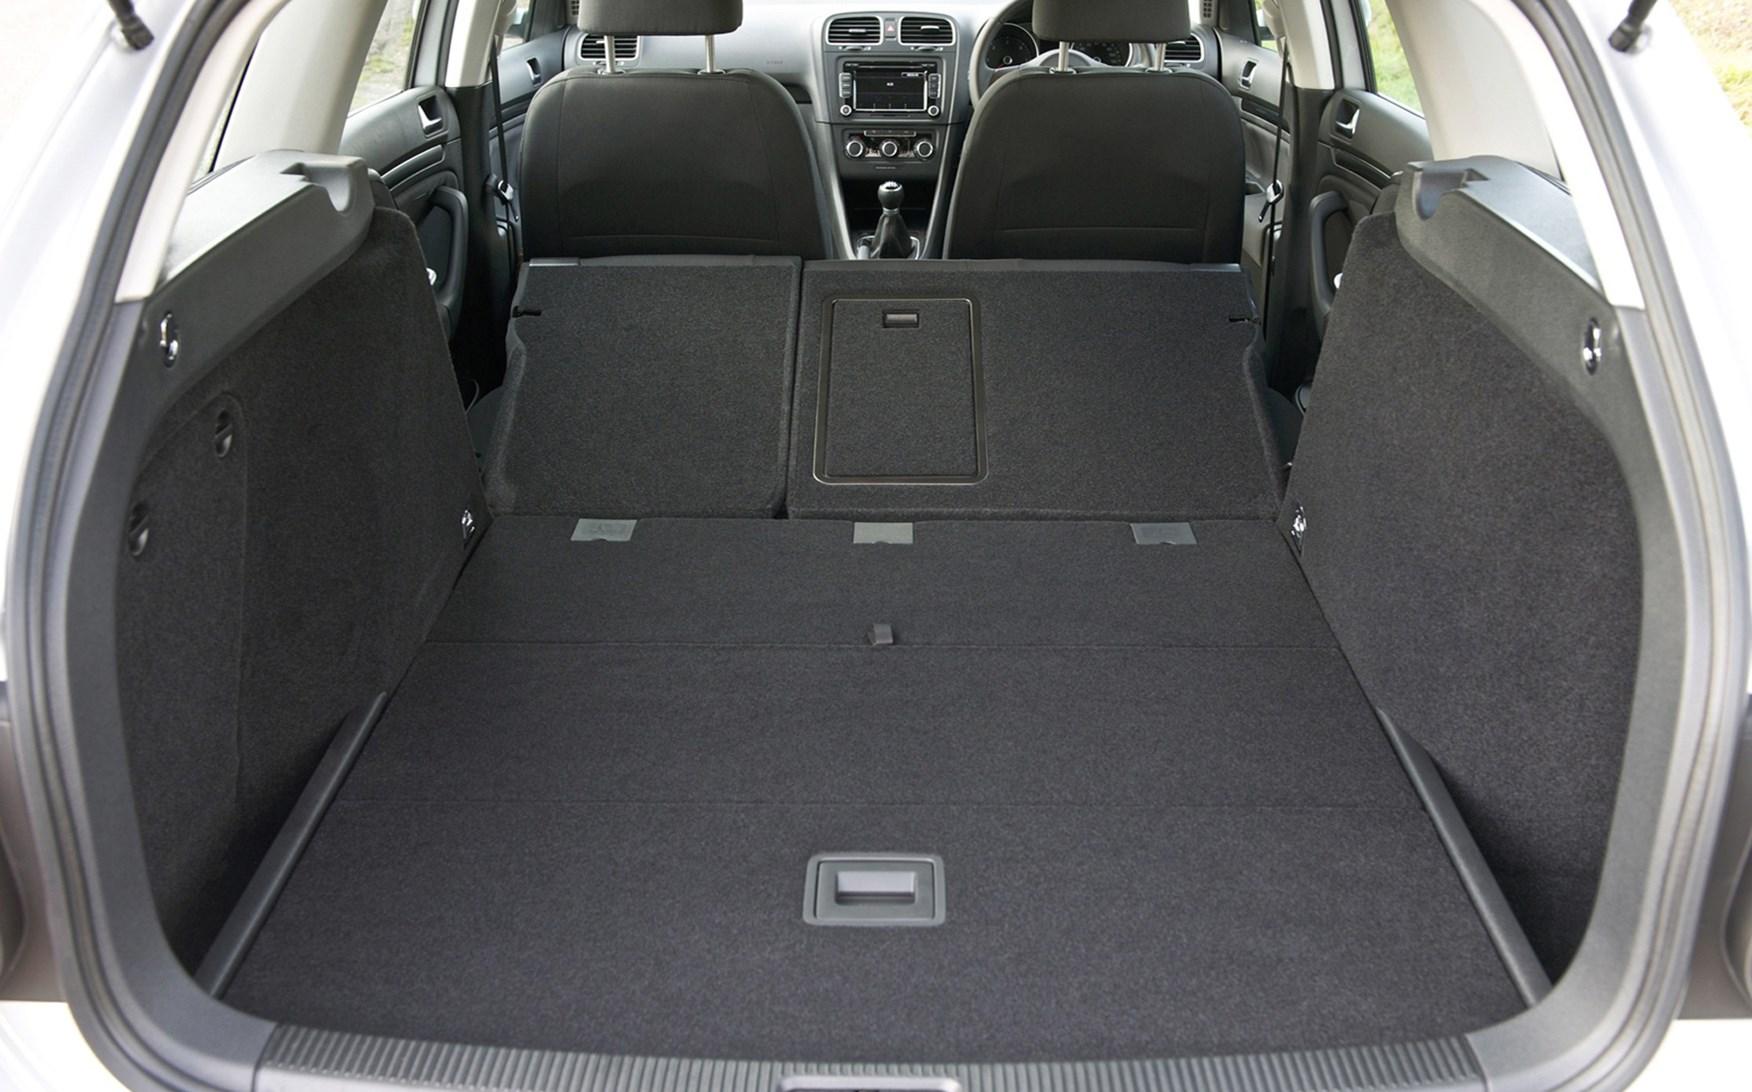 Volkswagen Golf Estate (2009 - 2013) Features, Equipment and Accessories | Parkers